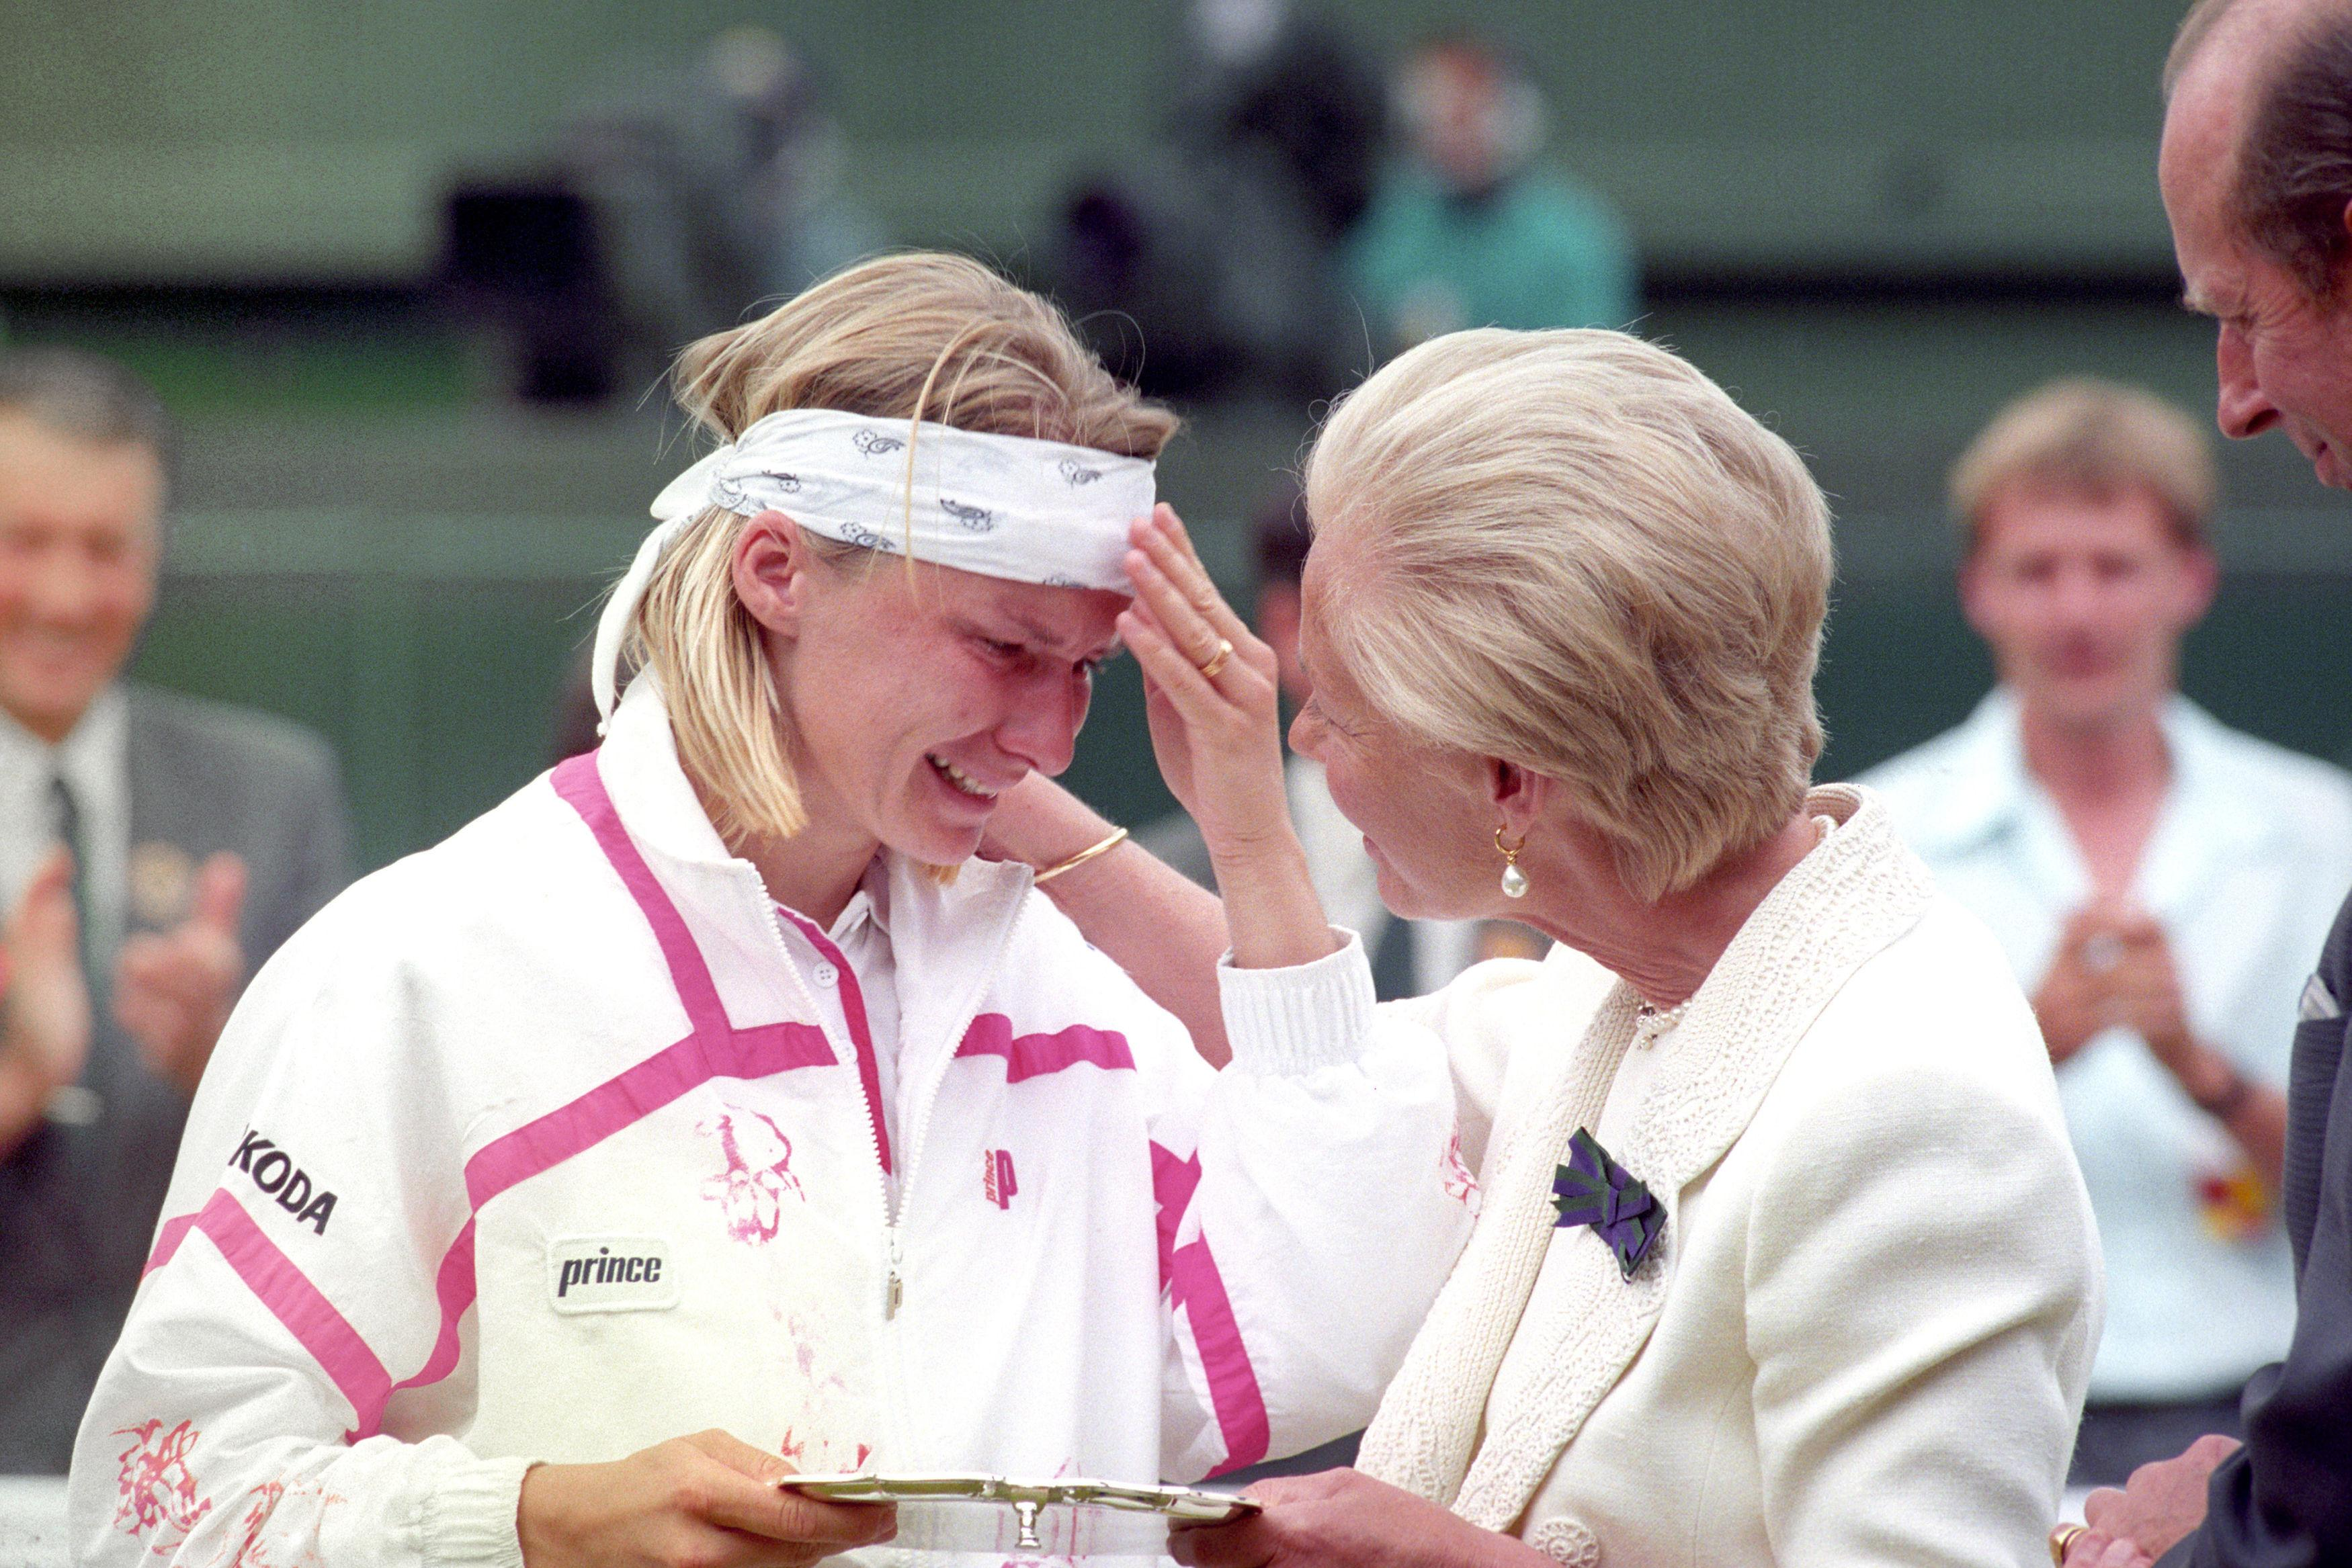 Jana Novotna sobbed on the Duchess of Kent's shoulder after the 1993 Wimbledon final